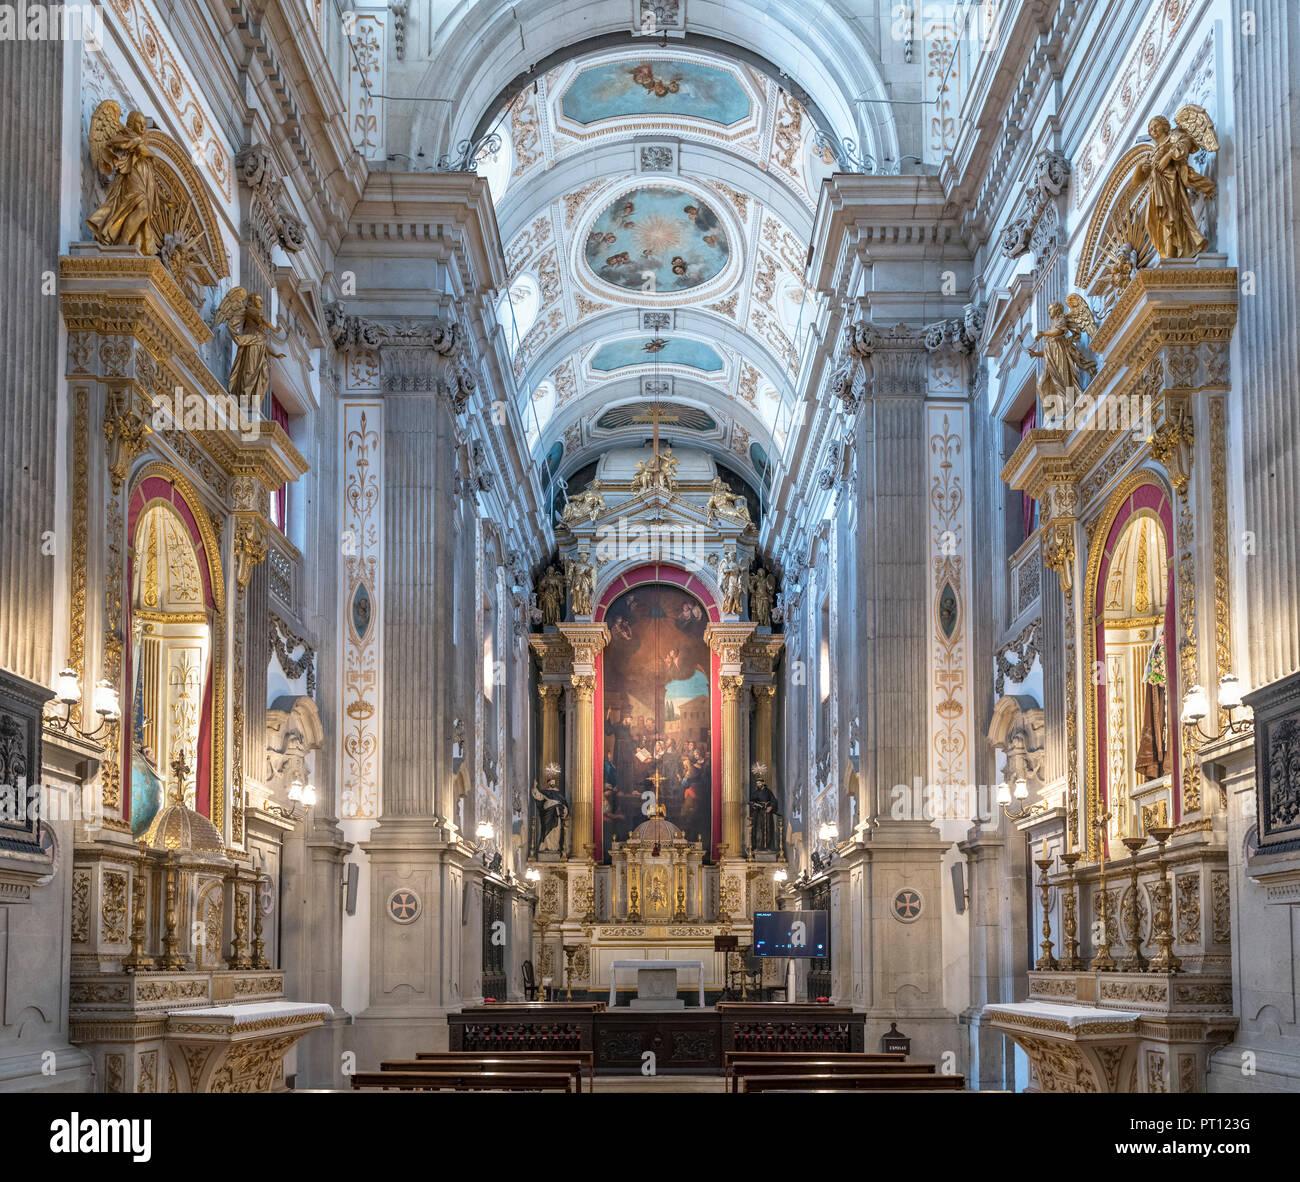 Igreja dos Terceiros de São Francisco (Église du Tiers Ordre de Saint François), l'Ordre de Saint François Museum, Porto, Portugal Photo Stock